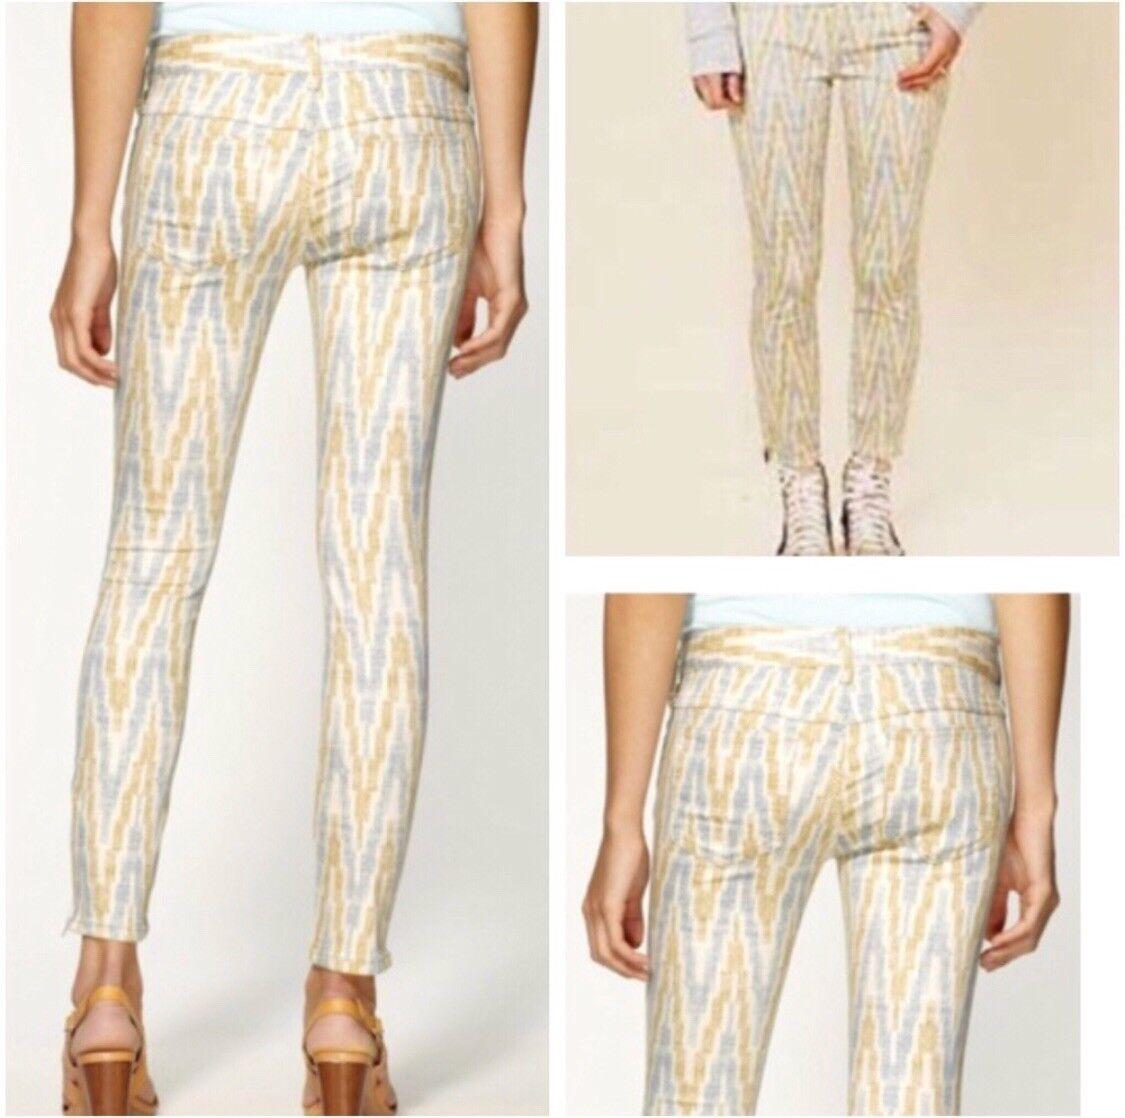 Free People Ikat Ankle Zip Skinny Jeans Boho Size 25 Woman